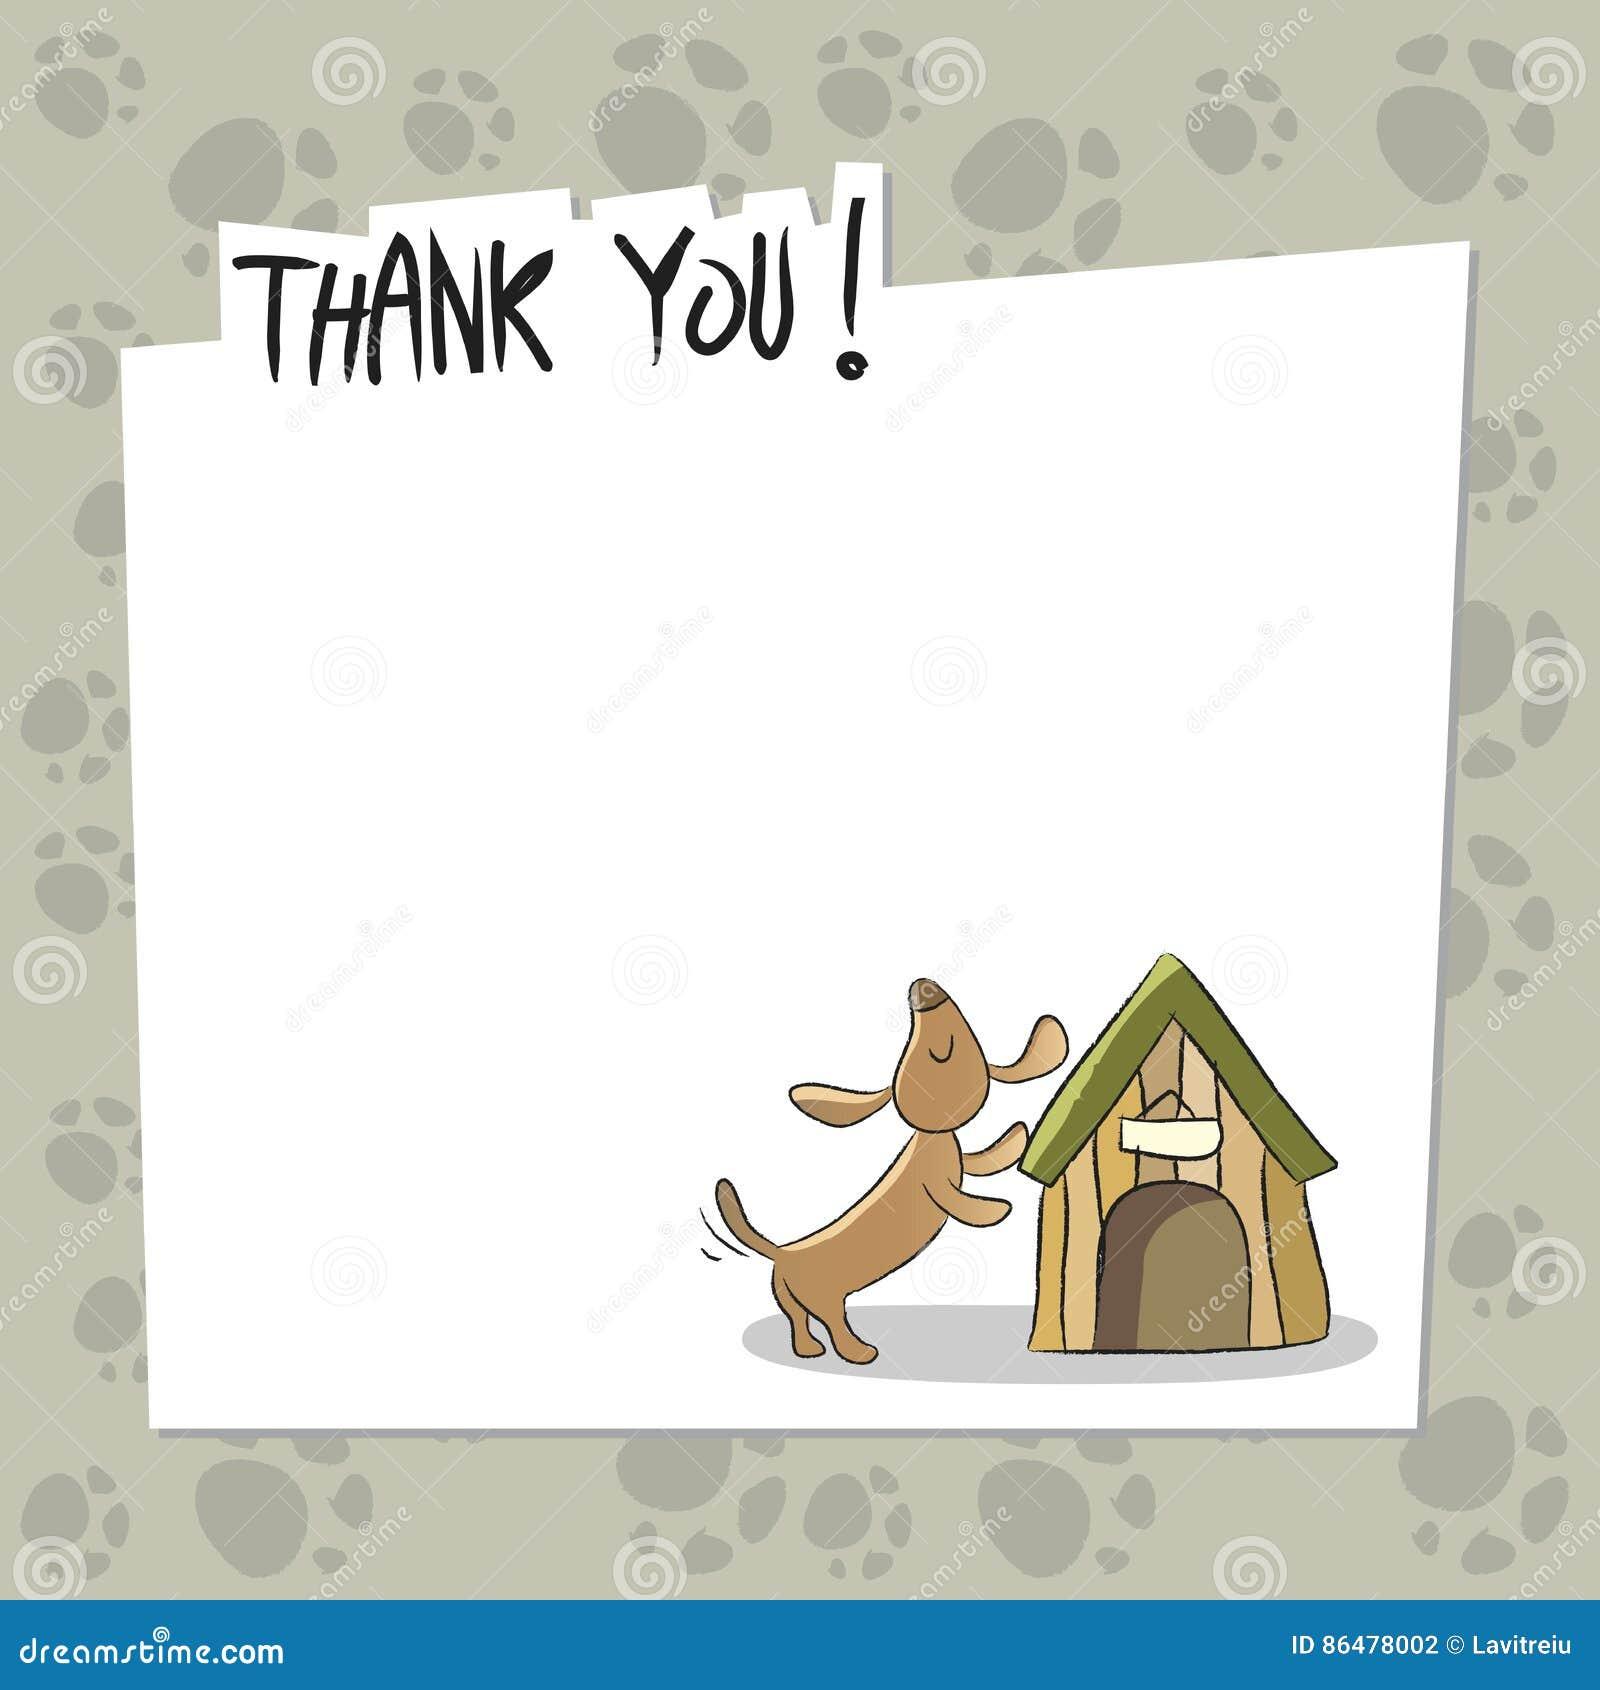 Dog Thank You Card Stock Vector Illustration Of Appreciation 86478002